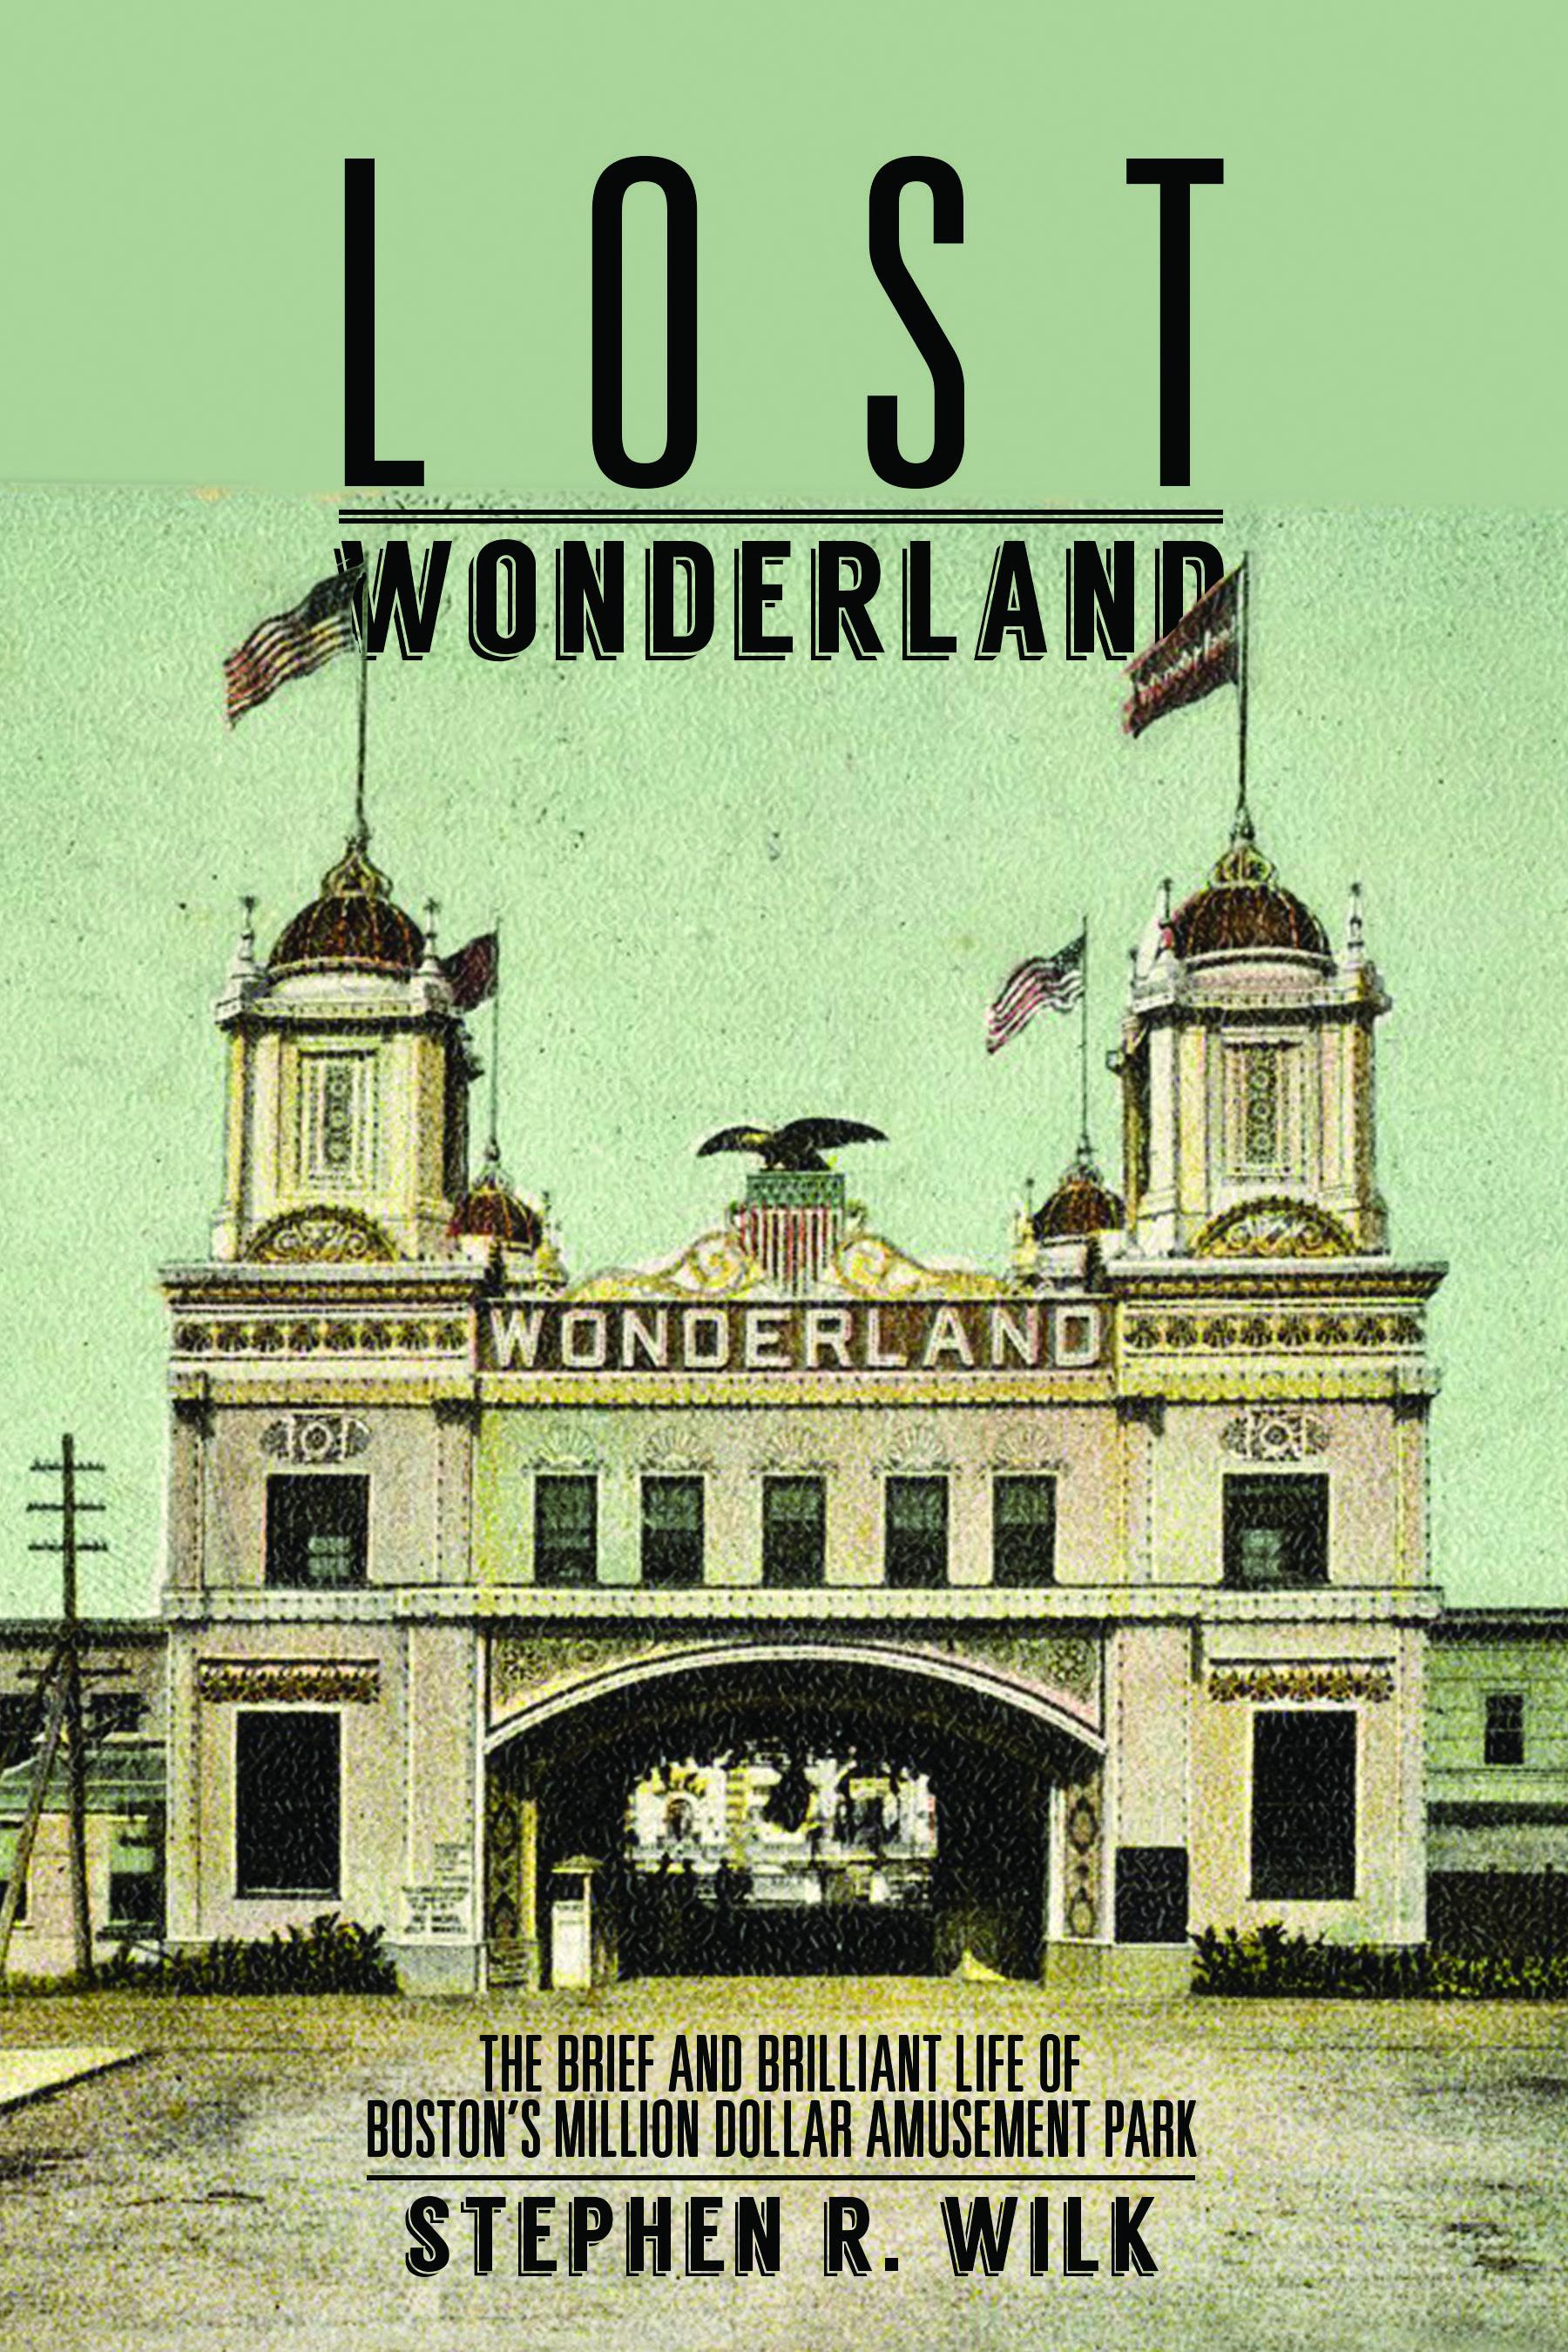 Lost Wonderland: The Brief and Brilliant Life of Boston's Million Dollar Amusement Park